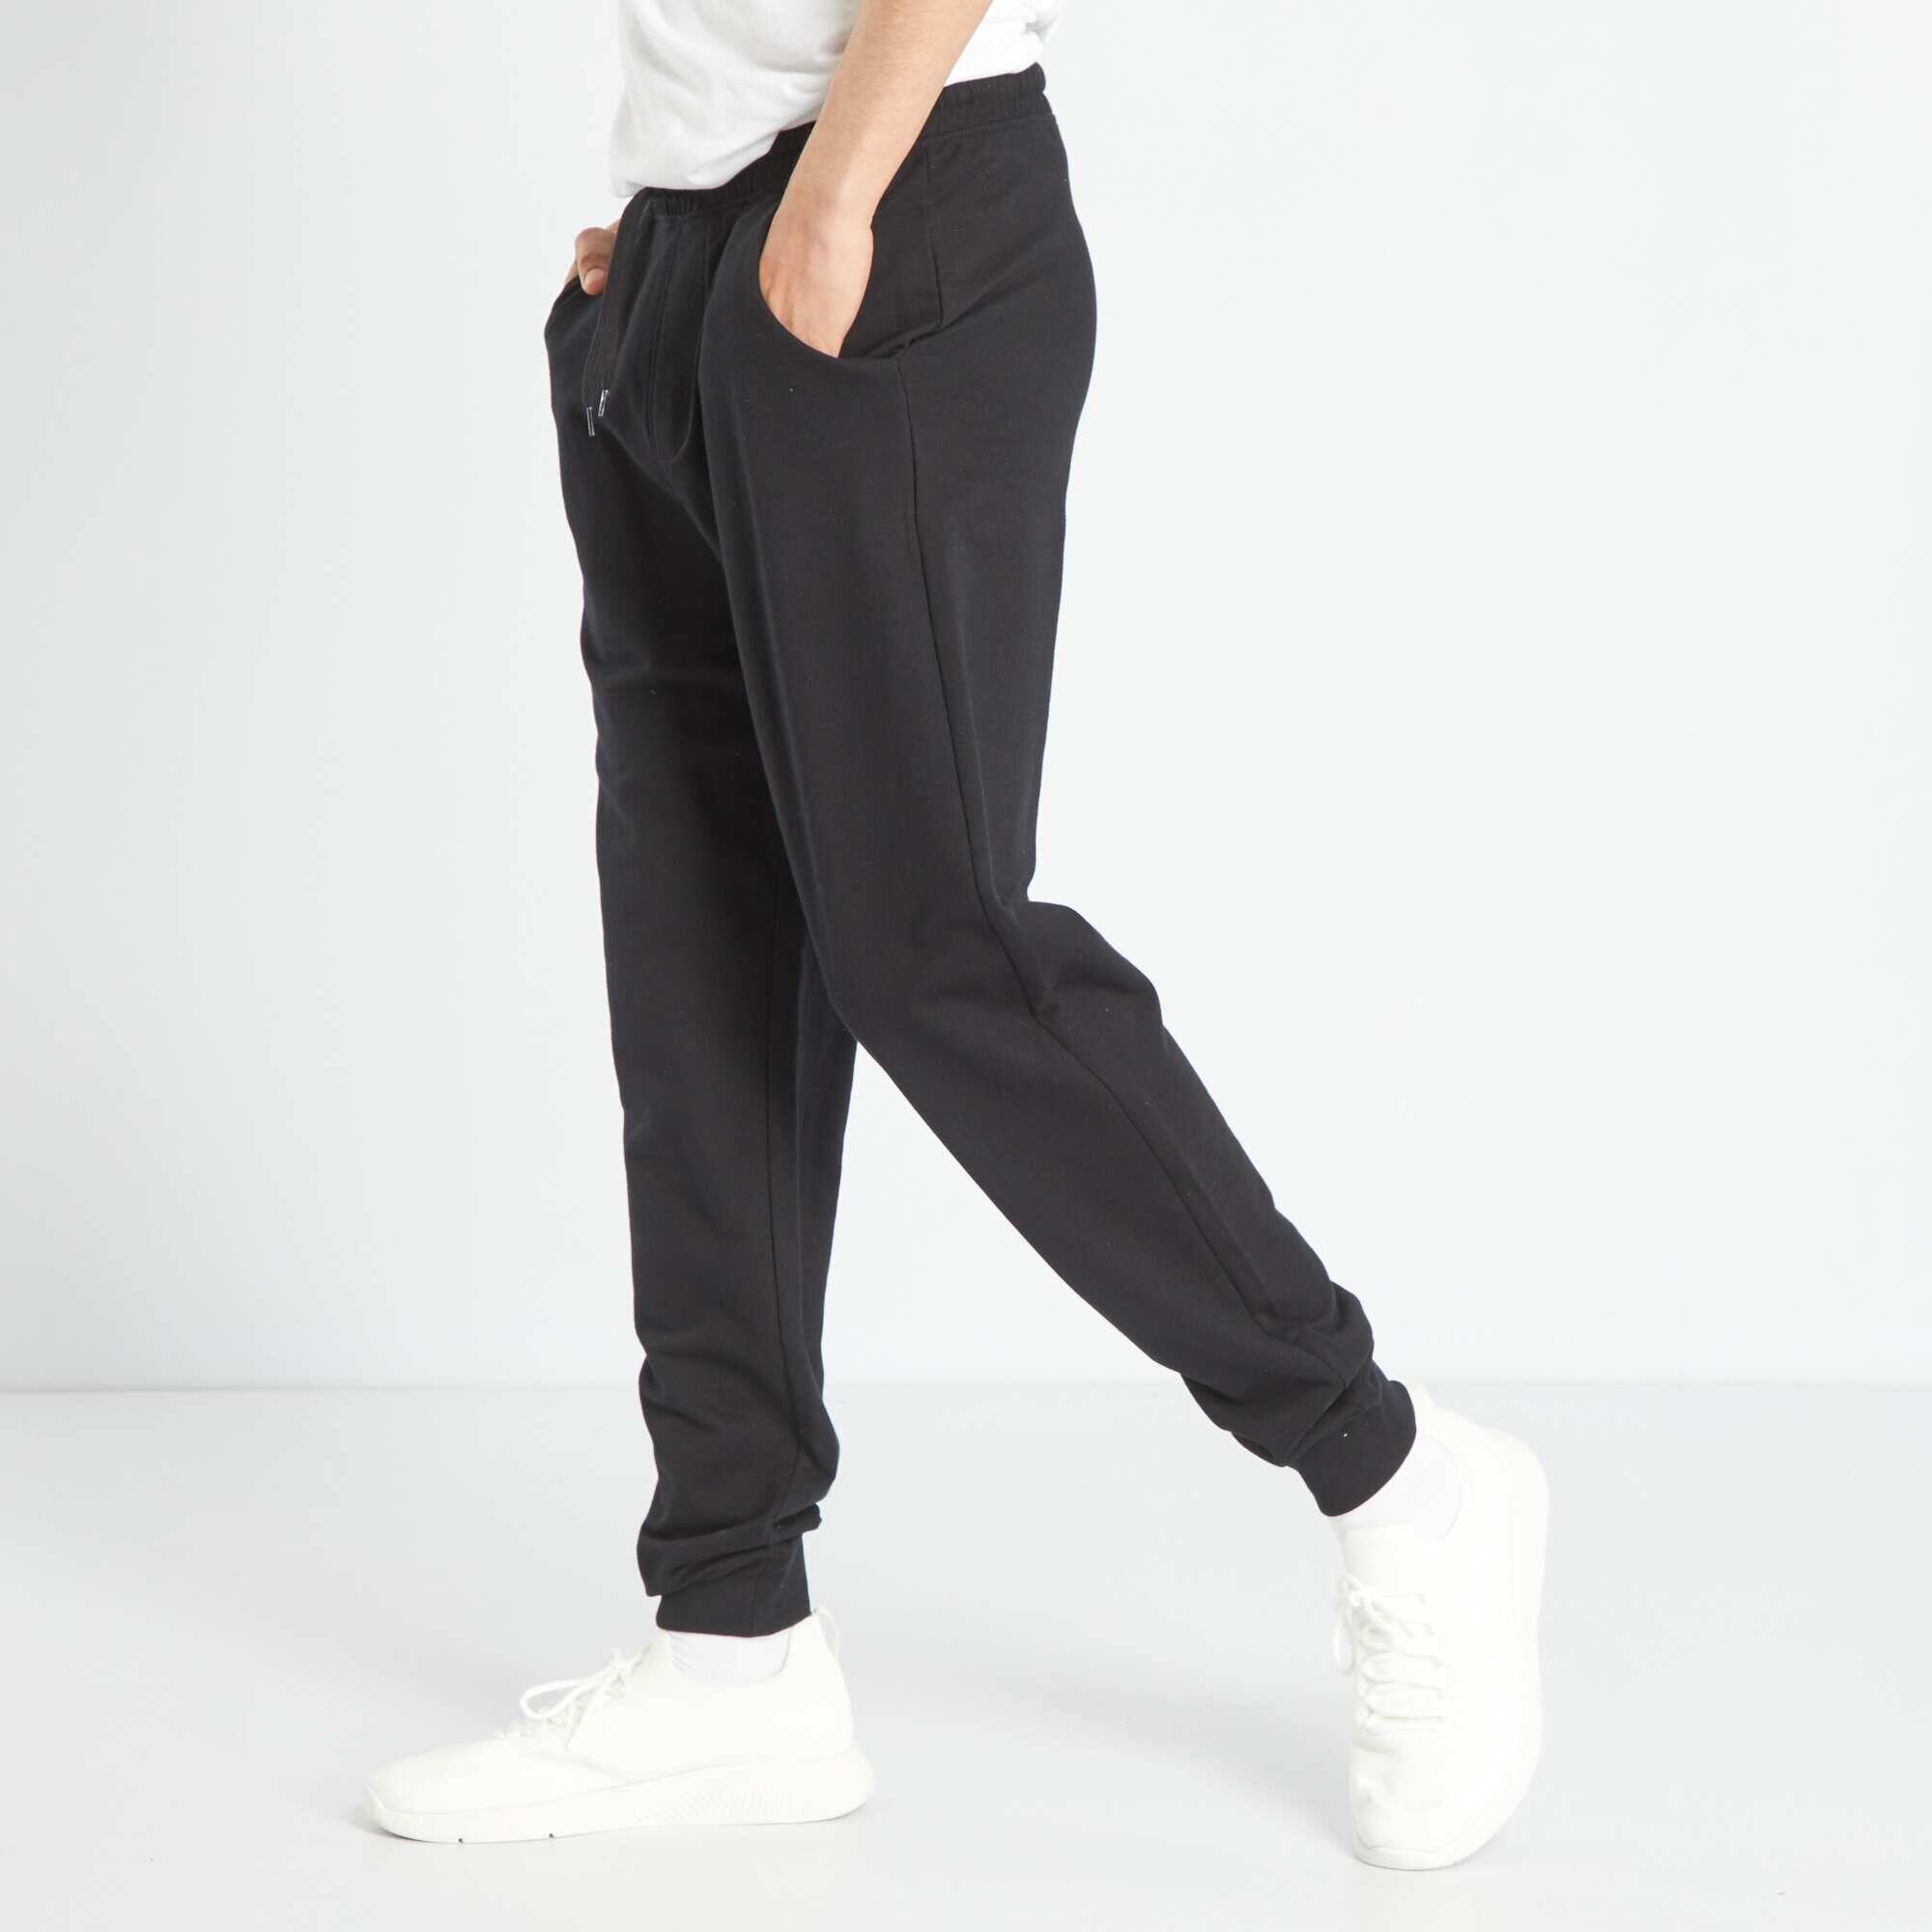 pantalon de sport gar on adolescent noir kiabi 8 00. Black Bedroom Furniture Sets. Home Design Ideas